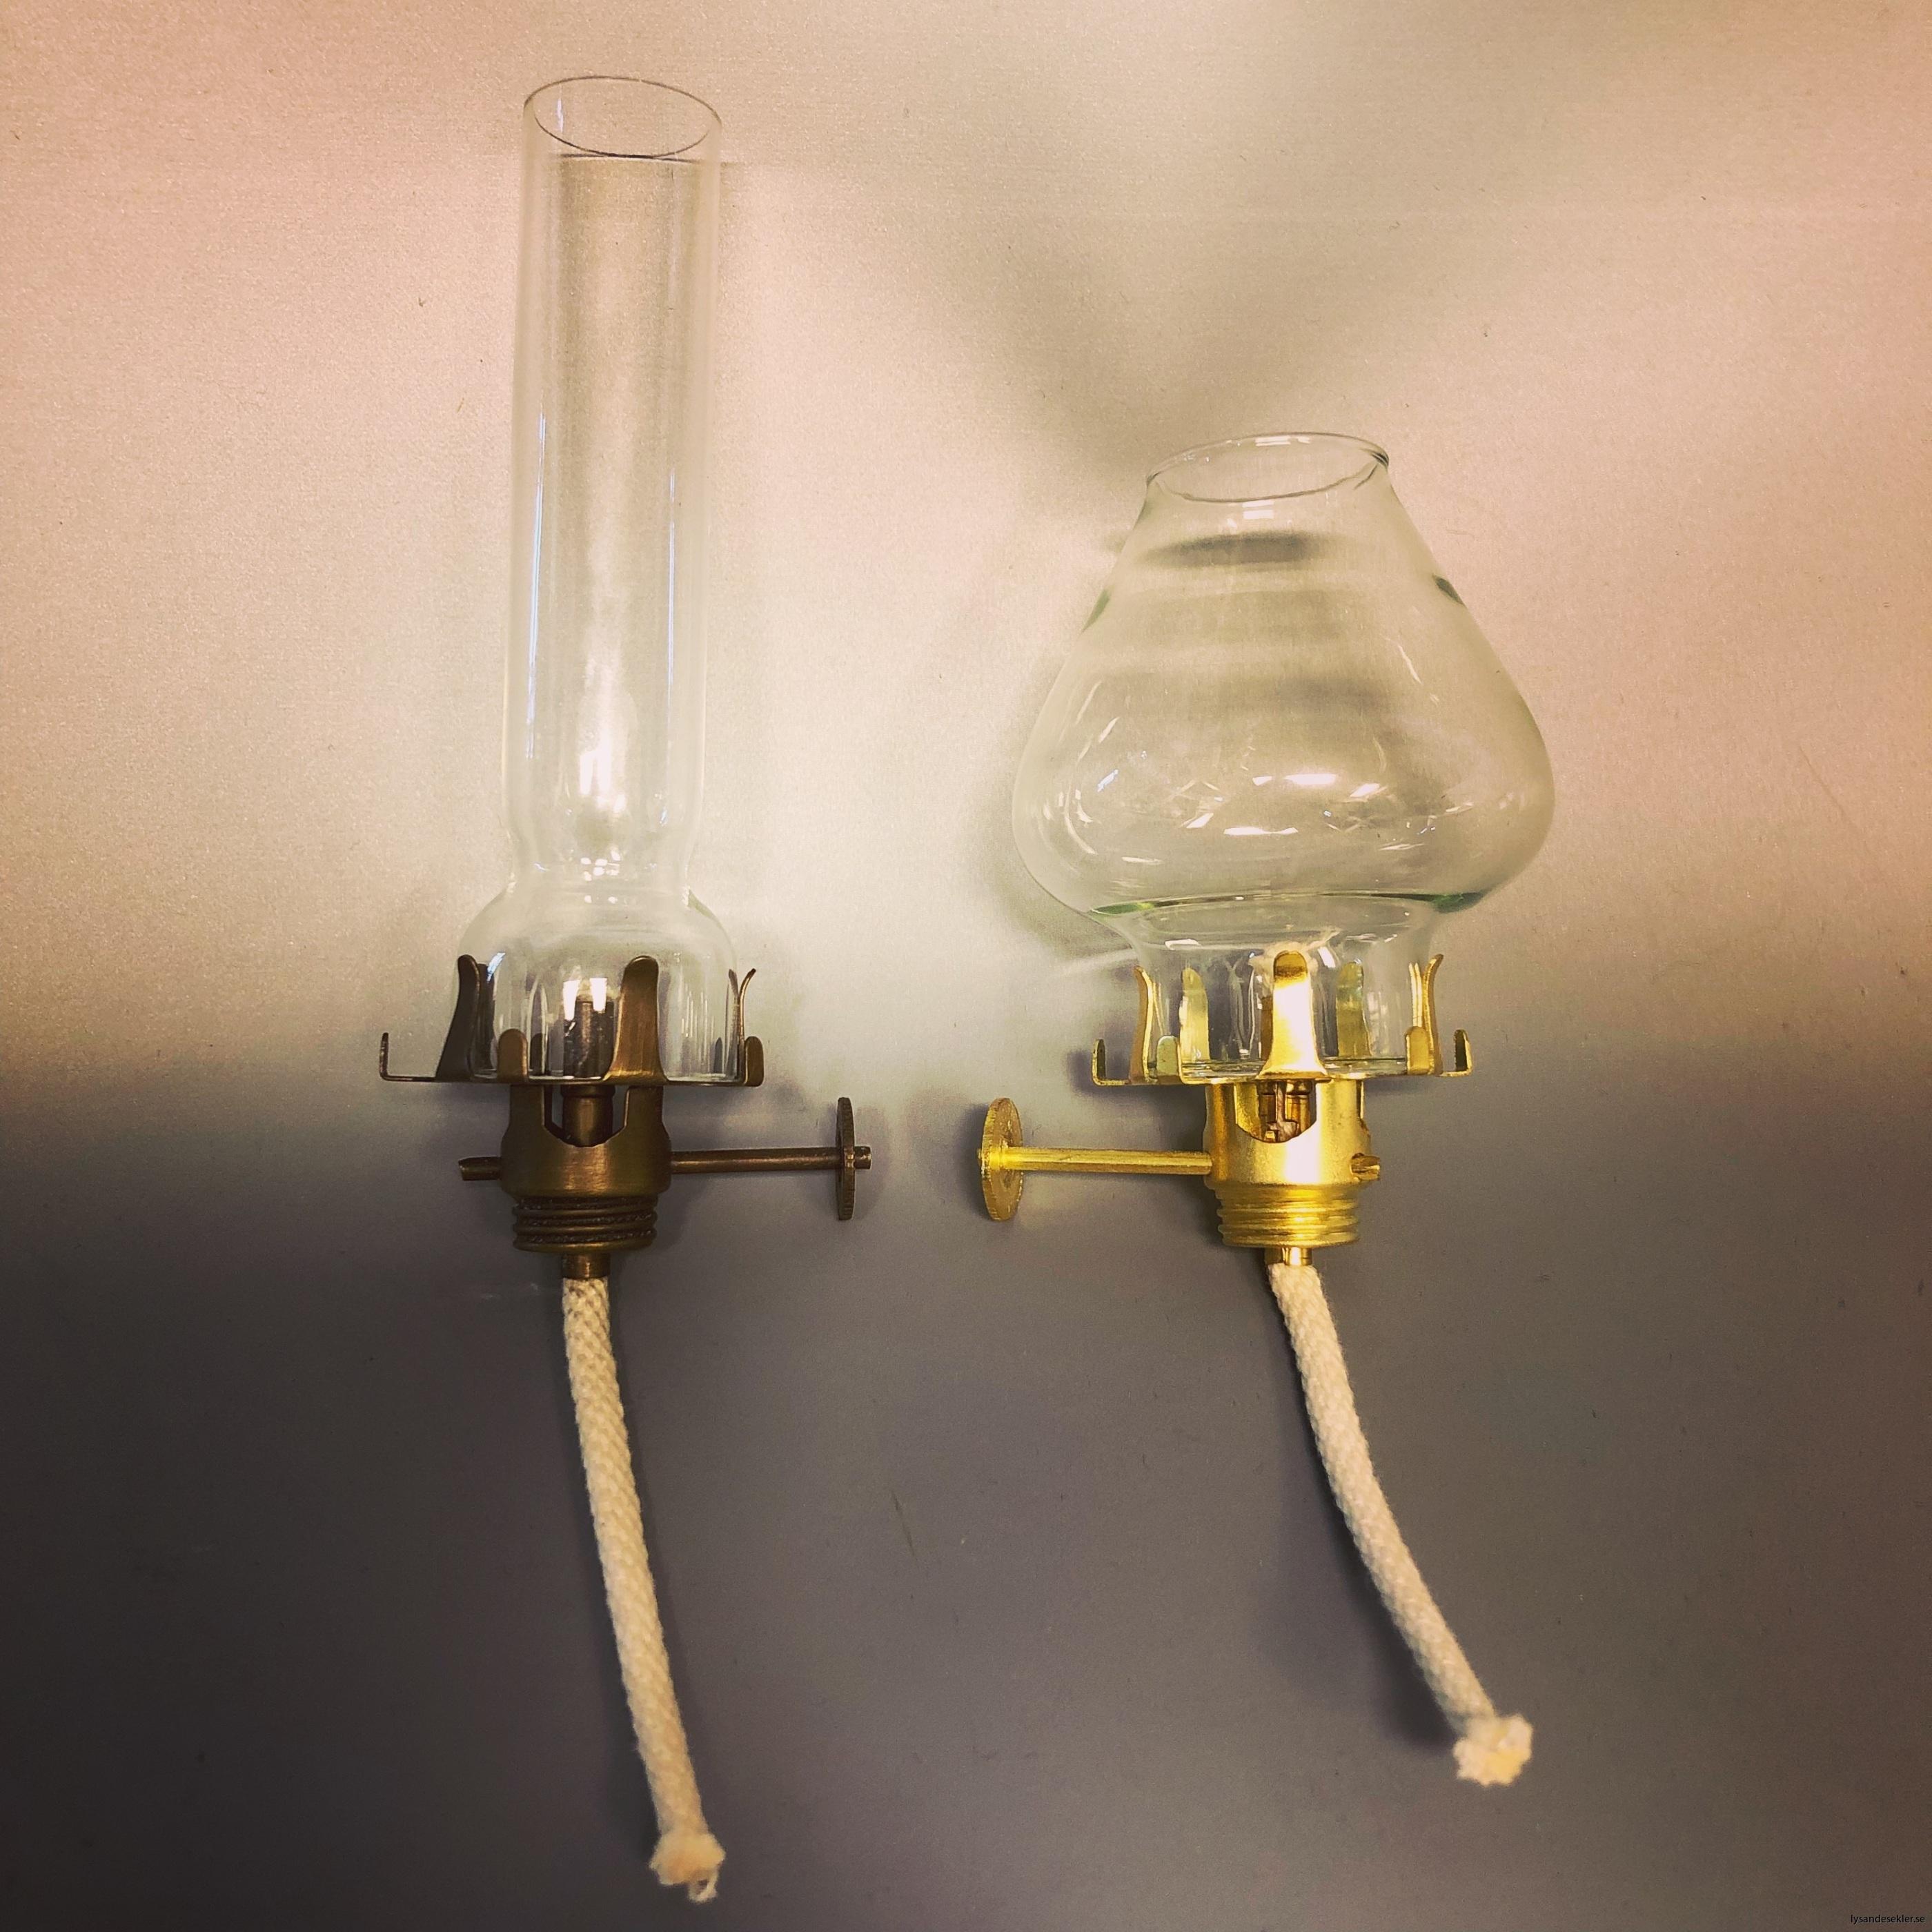 2 linjers brännare fotogenlampa5